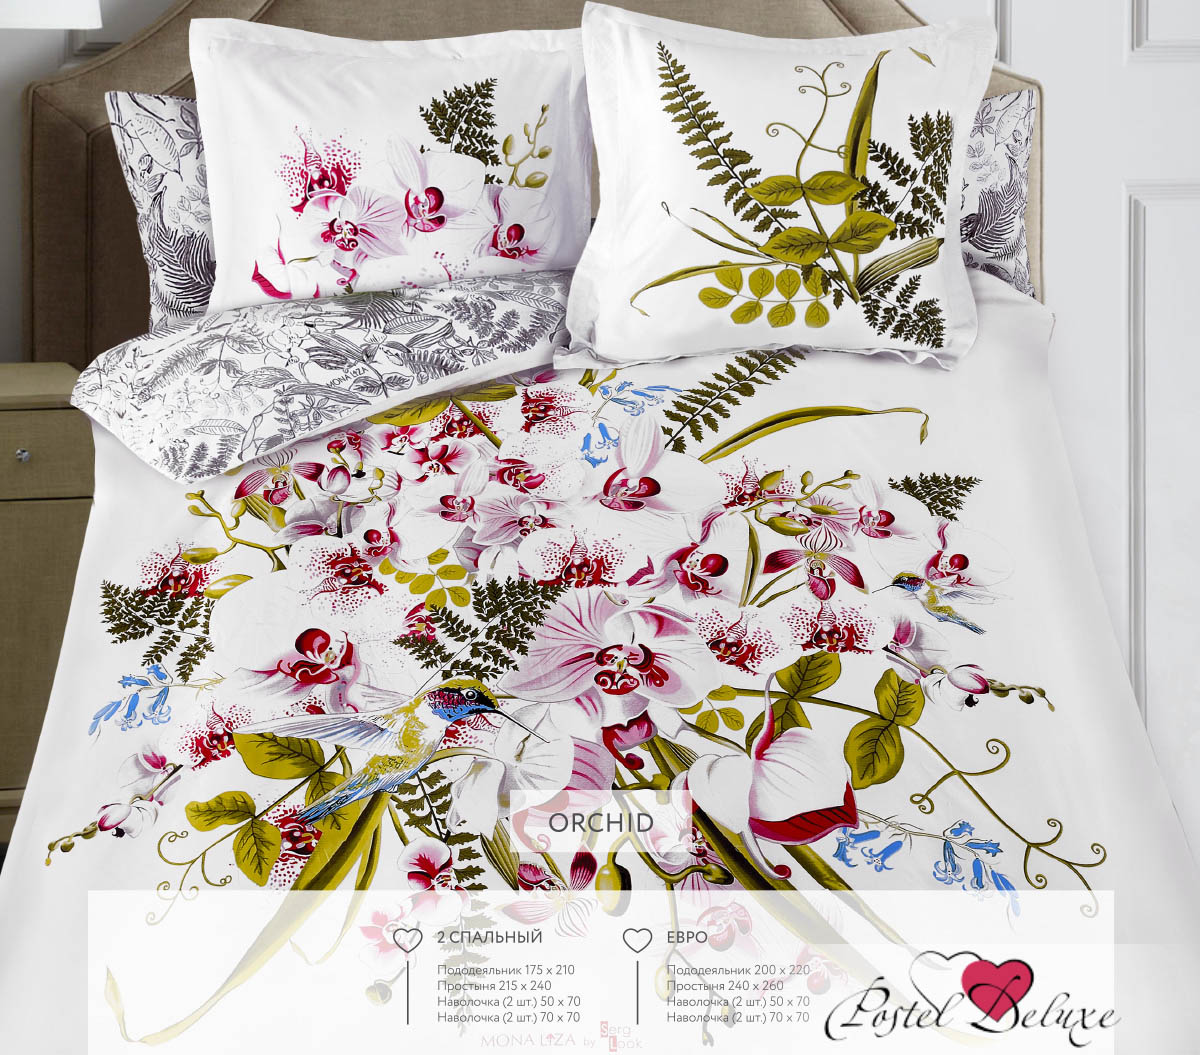 Постельное белье Mona Liza Постельное белье Orchid (2 сп. евро) комплект пб 2 сп mona liza сатин жаккард royal 4 нав 2шт 70х70 и 2 шт